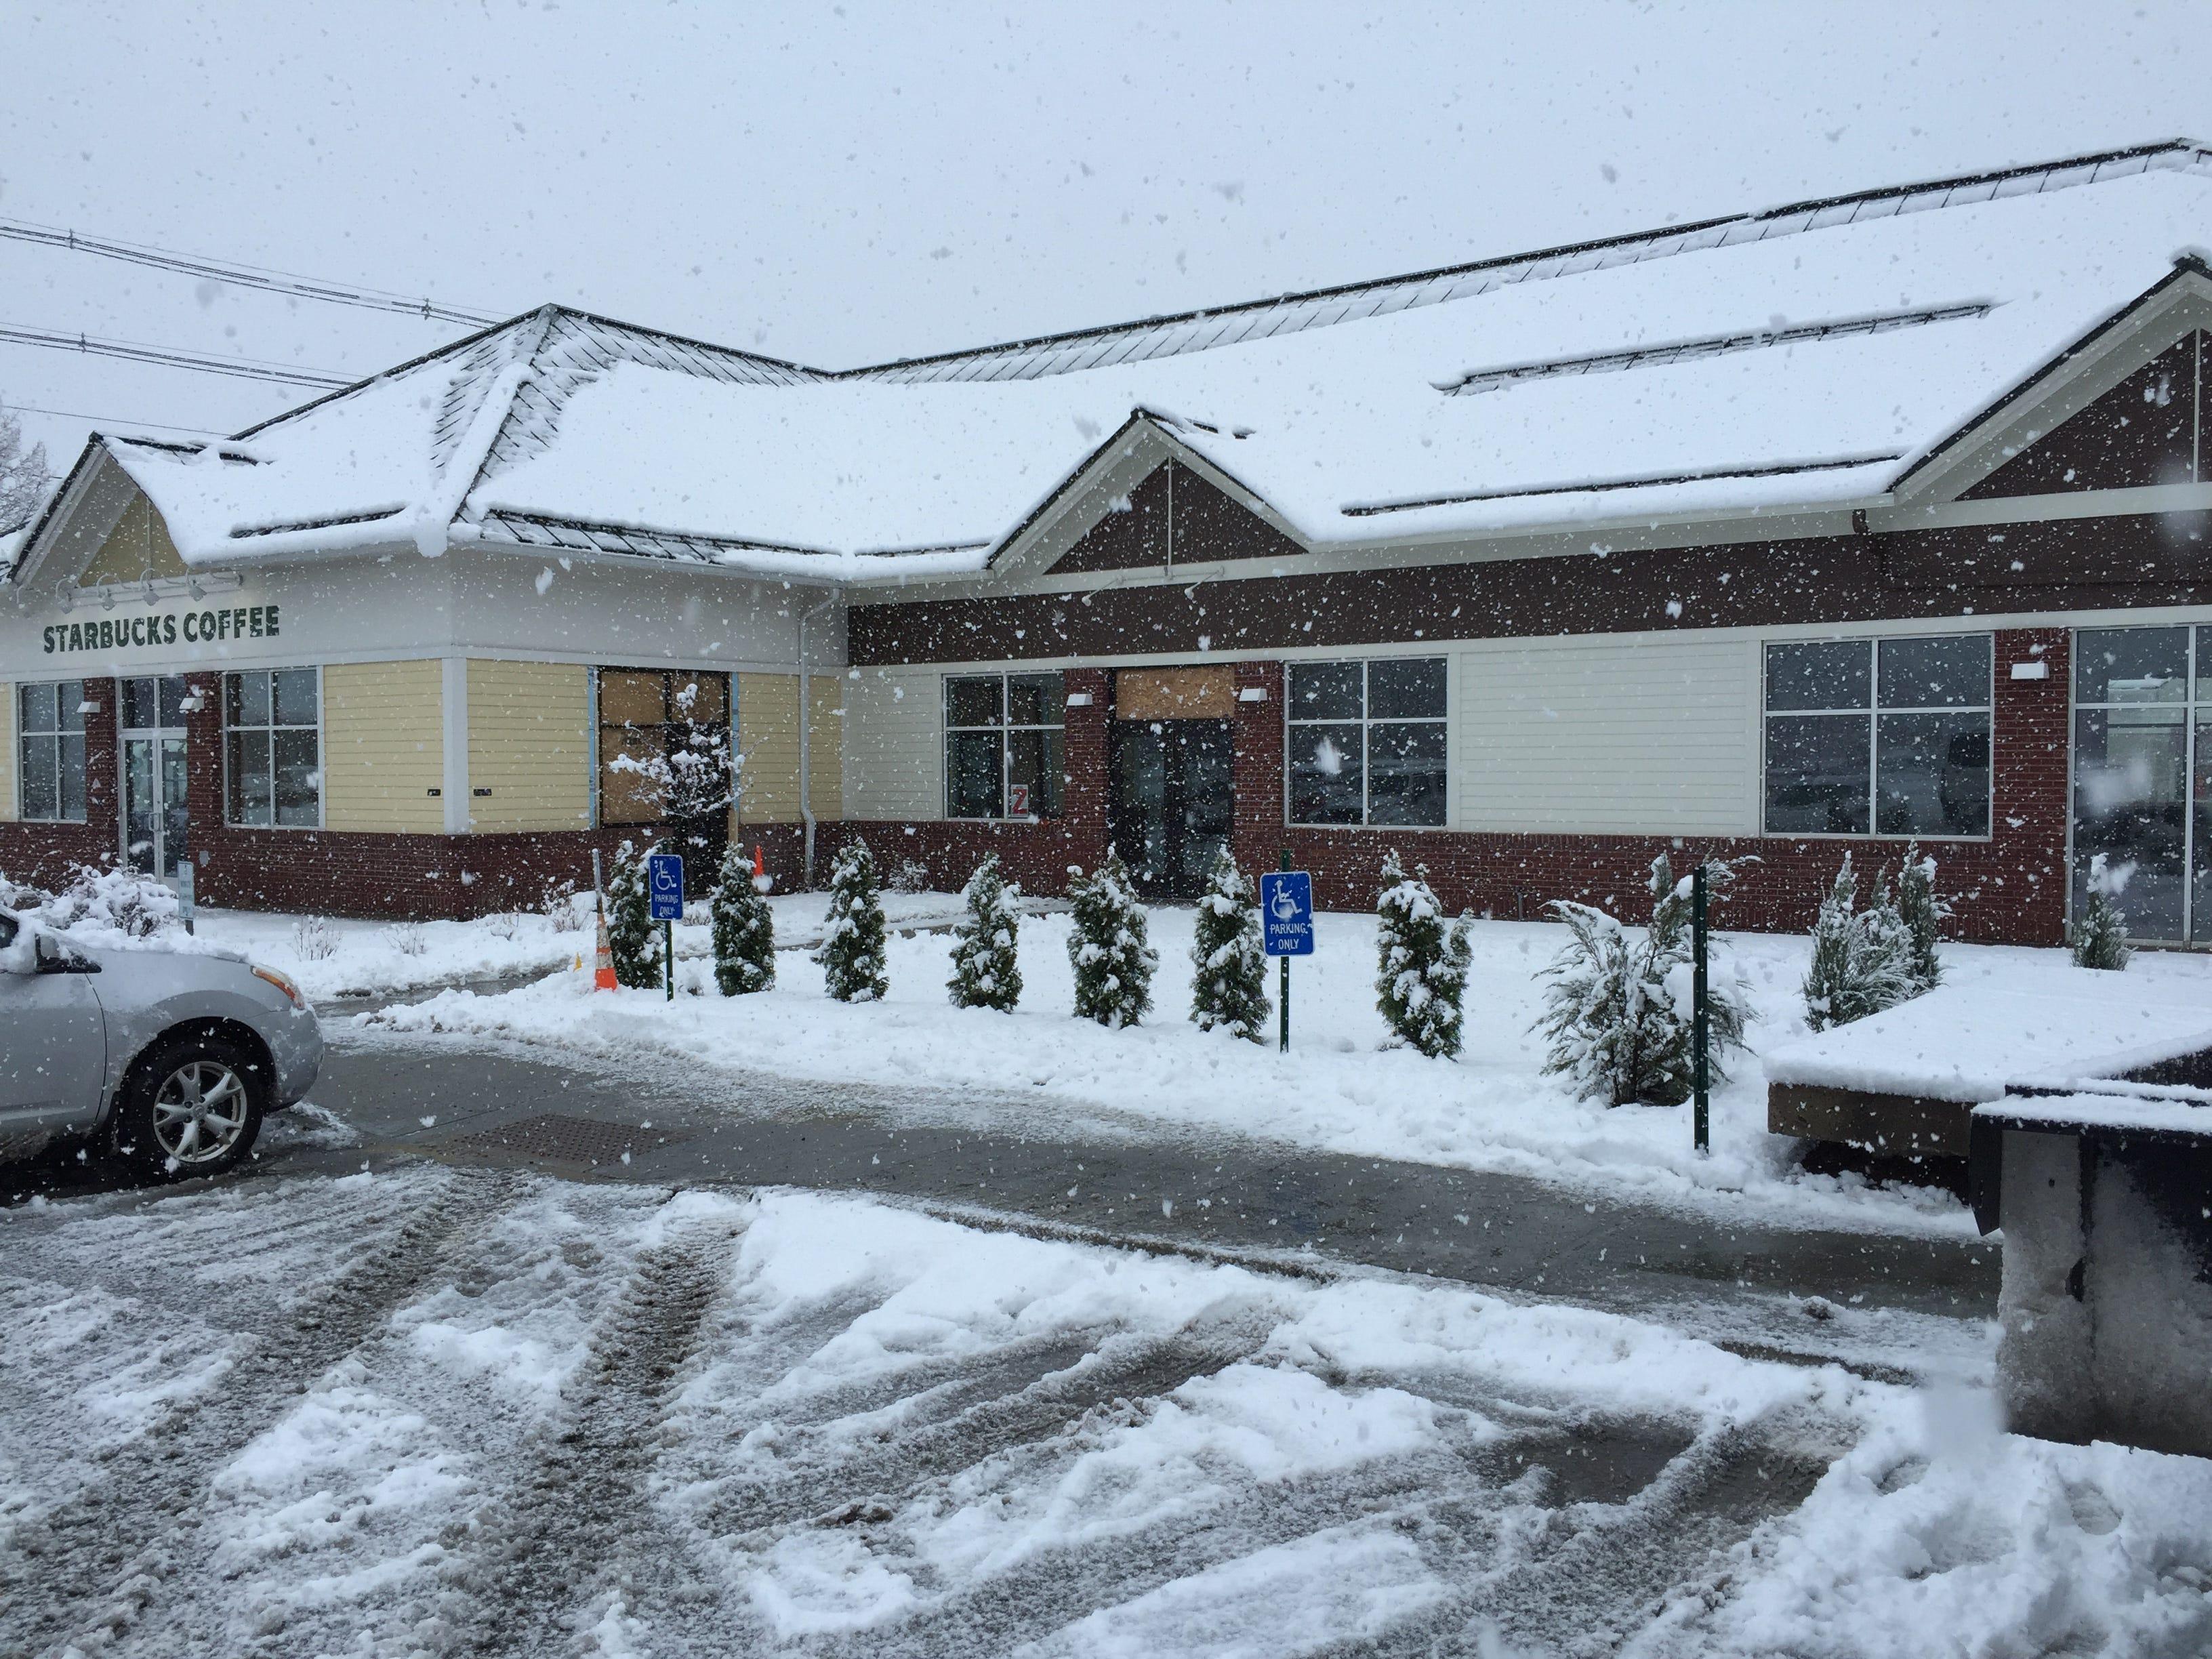 Farmhouse Group plans 3 eateries in Williston, So. Burlington, Winooski